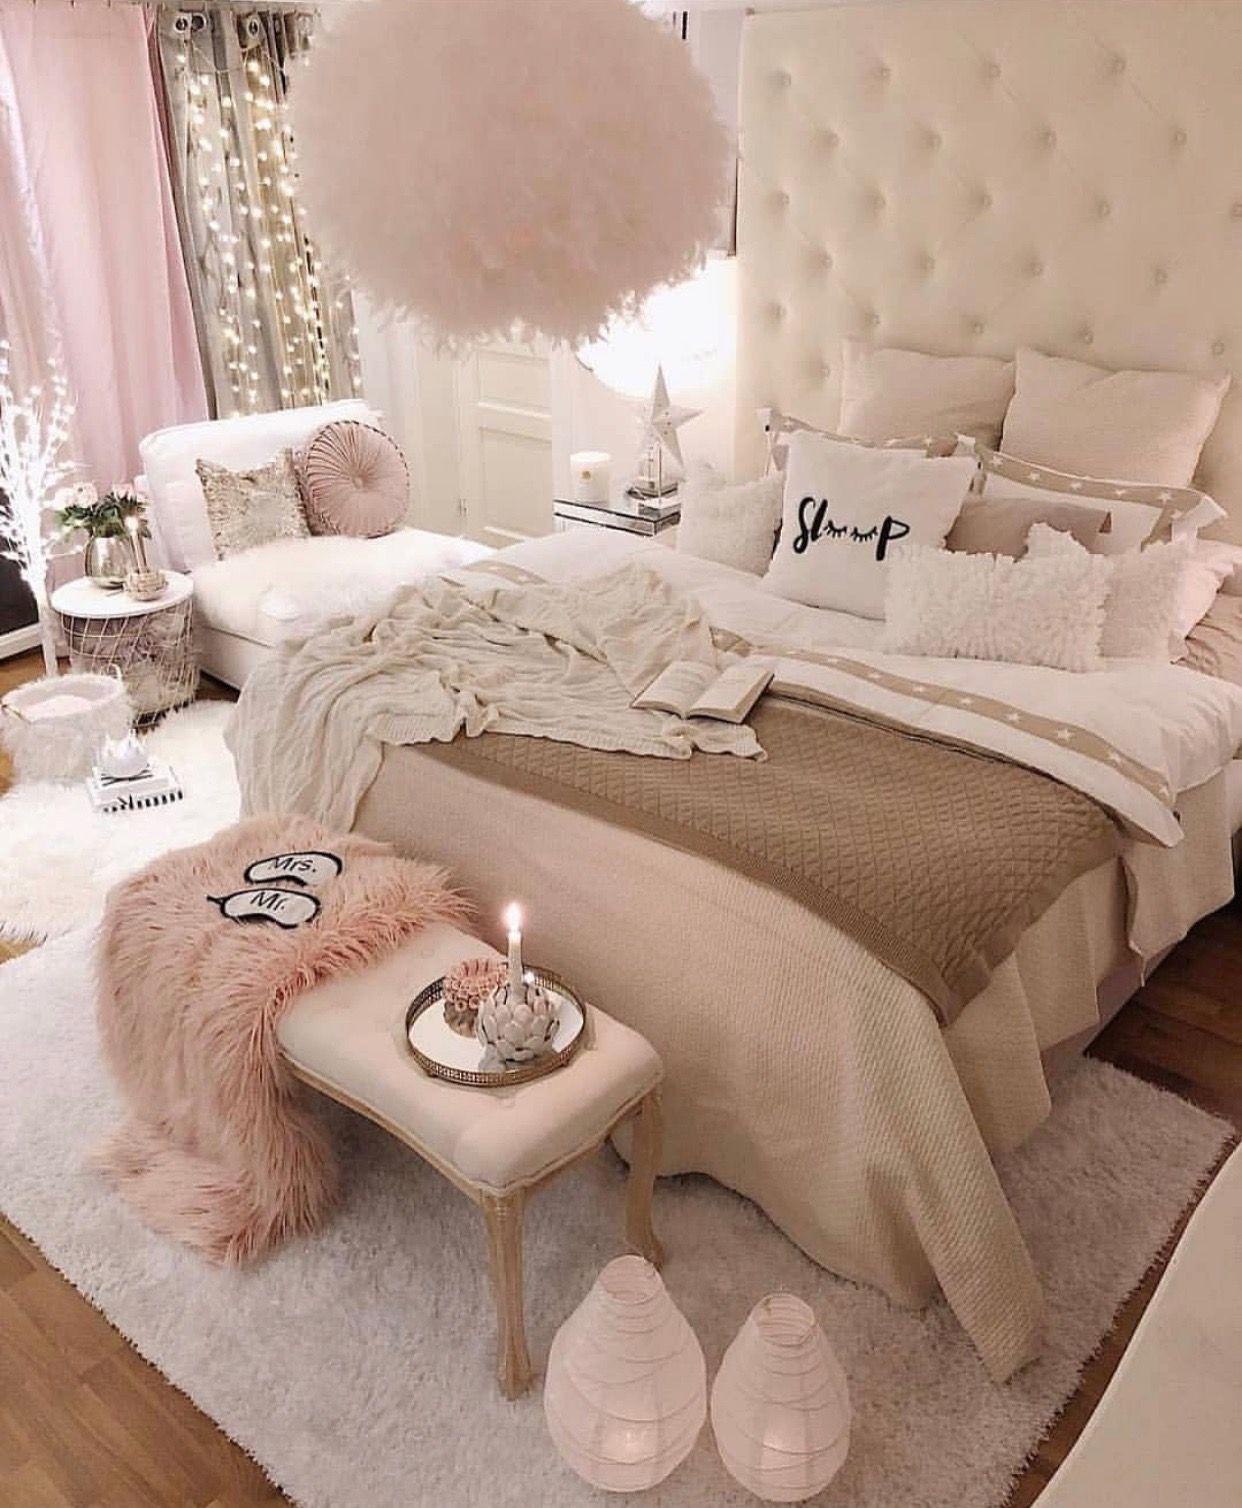 Pin By Miss Purple Rose On Idees Deco Fancy Bedroom Bedroom Interior Room Ideas Bedroom